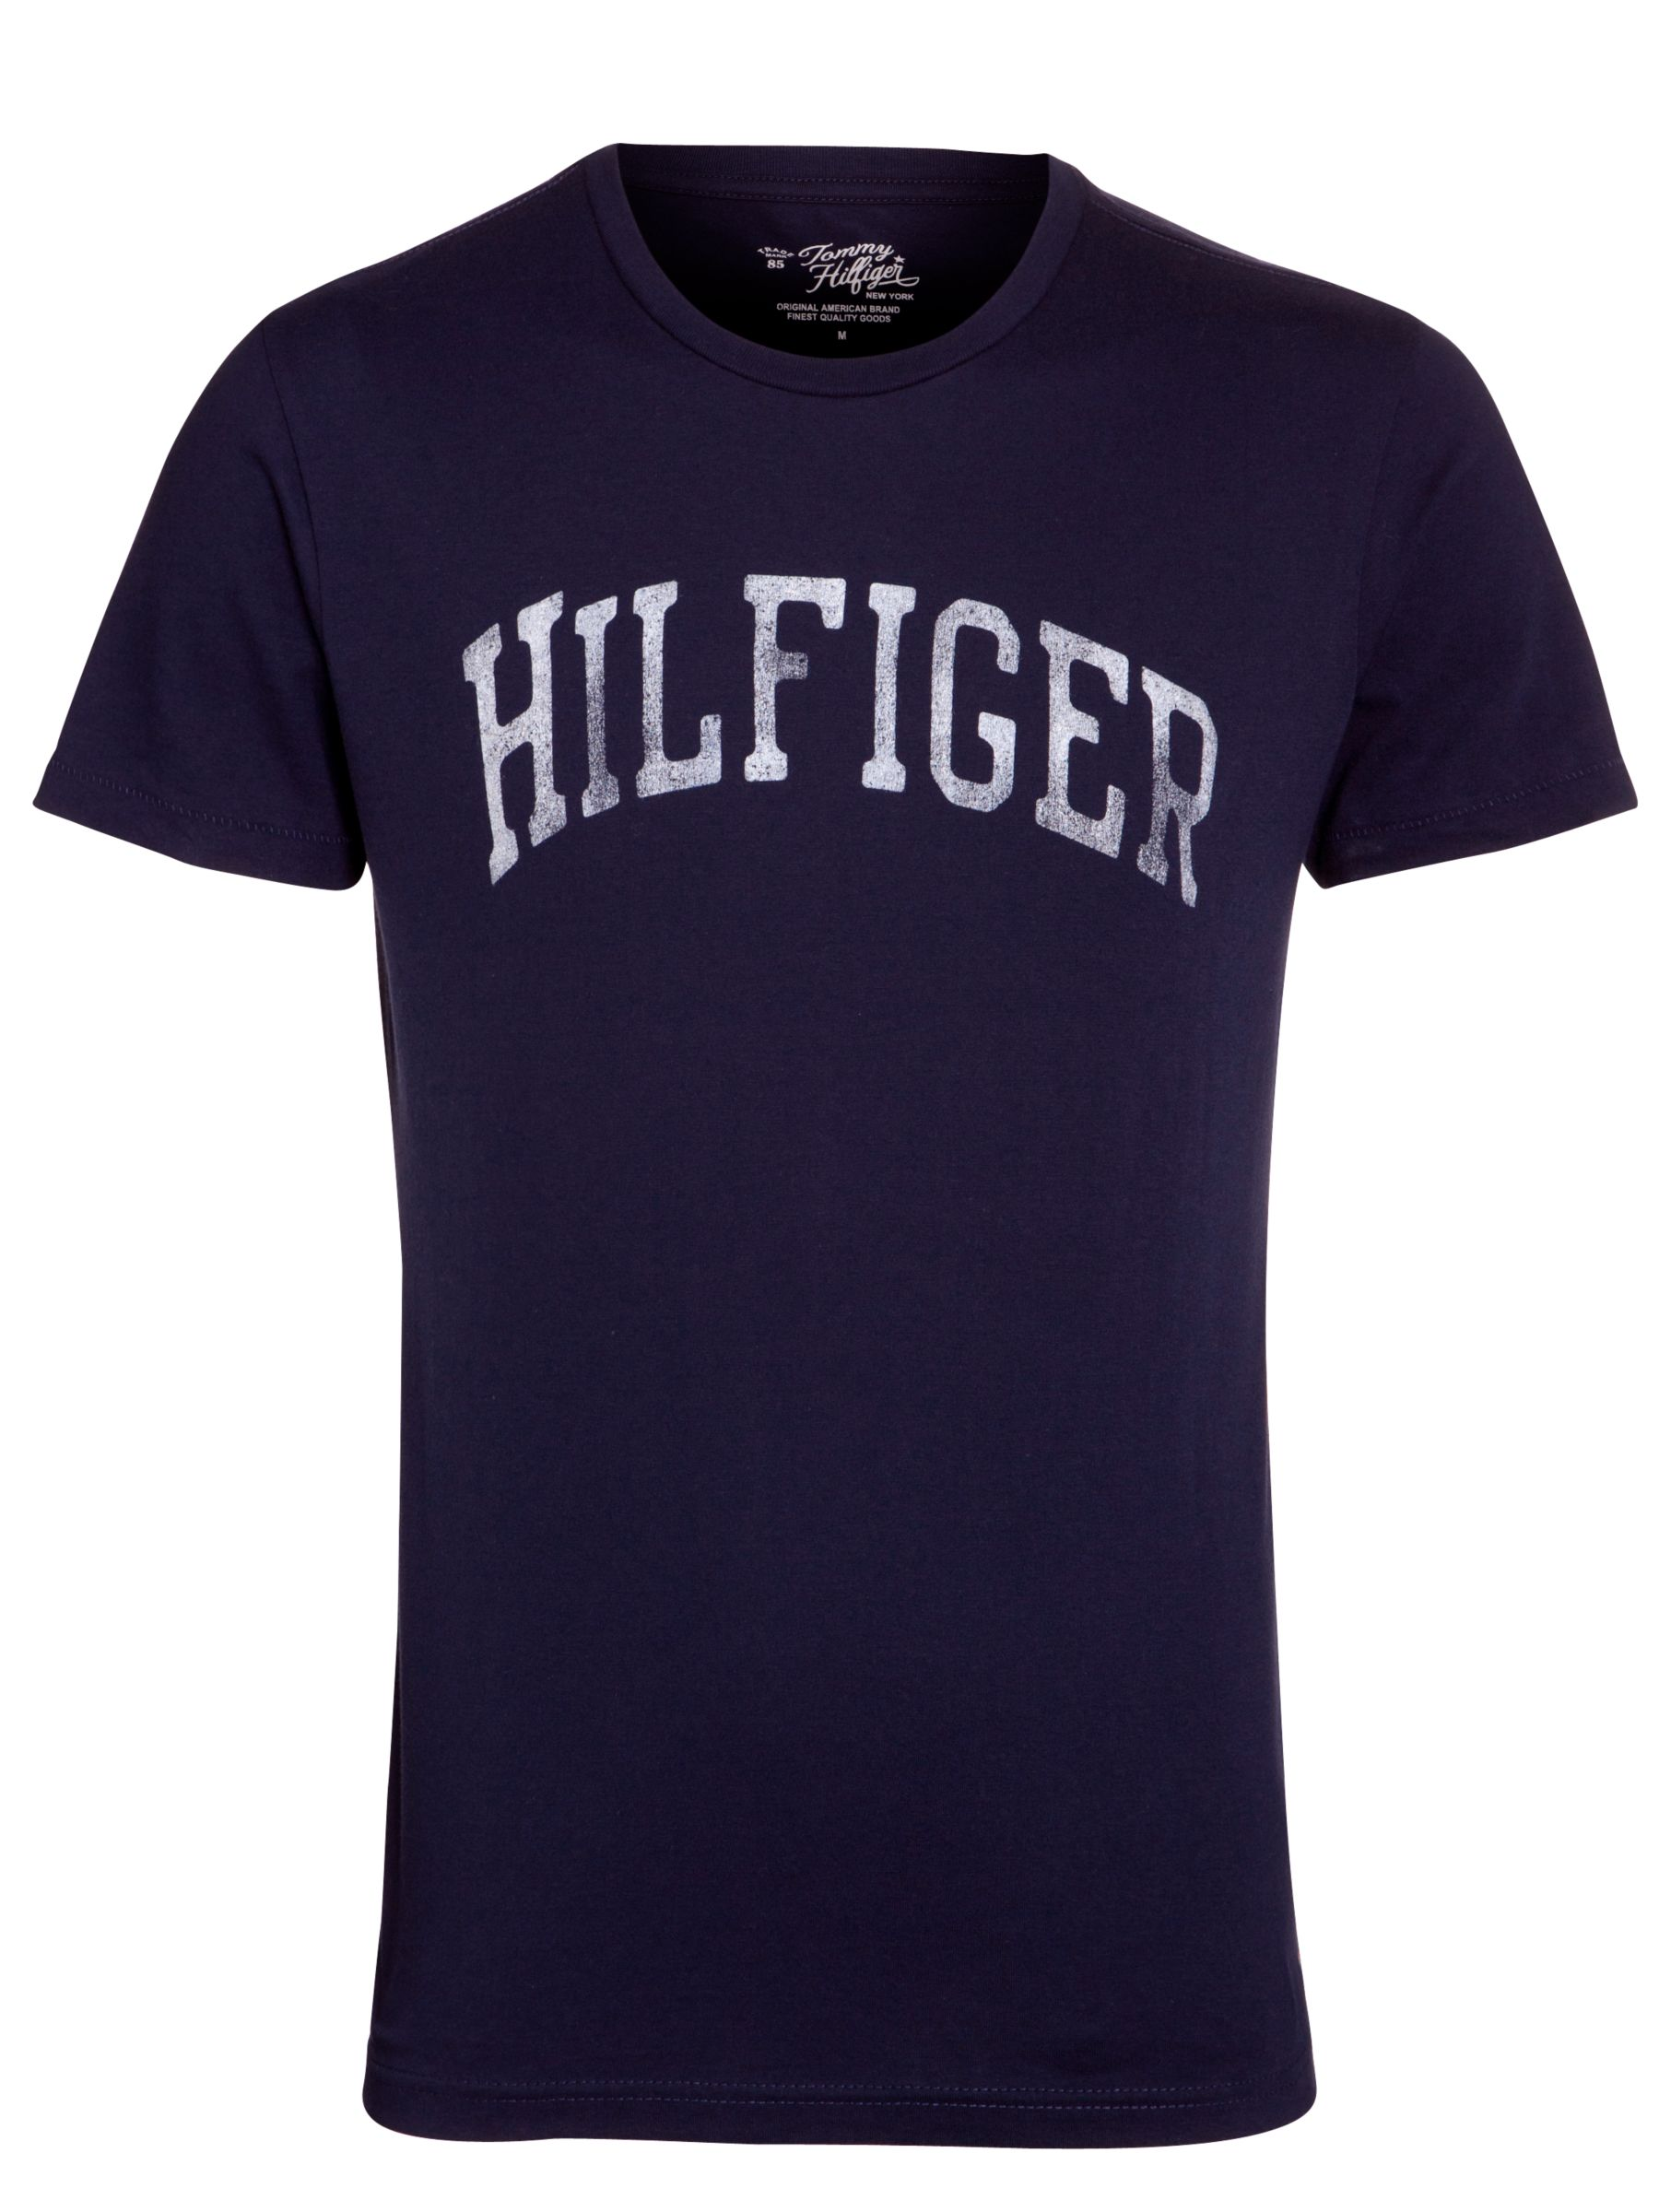 Tommy Hilfiger Glasgow T-Shirt, Navy